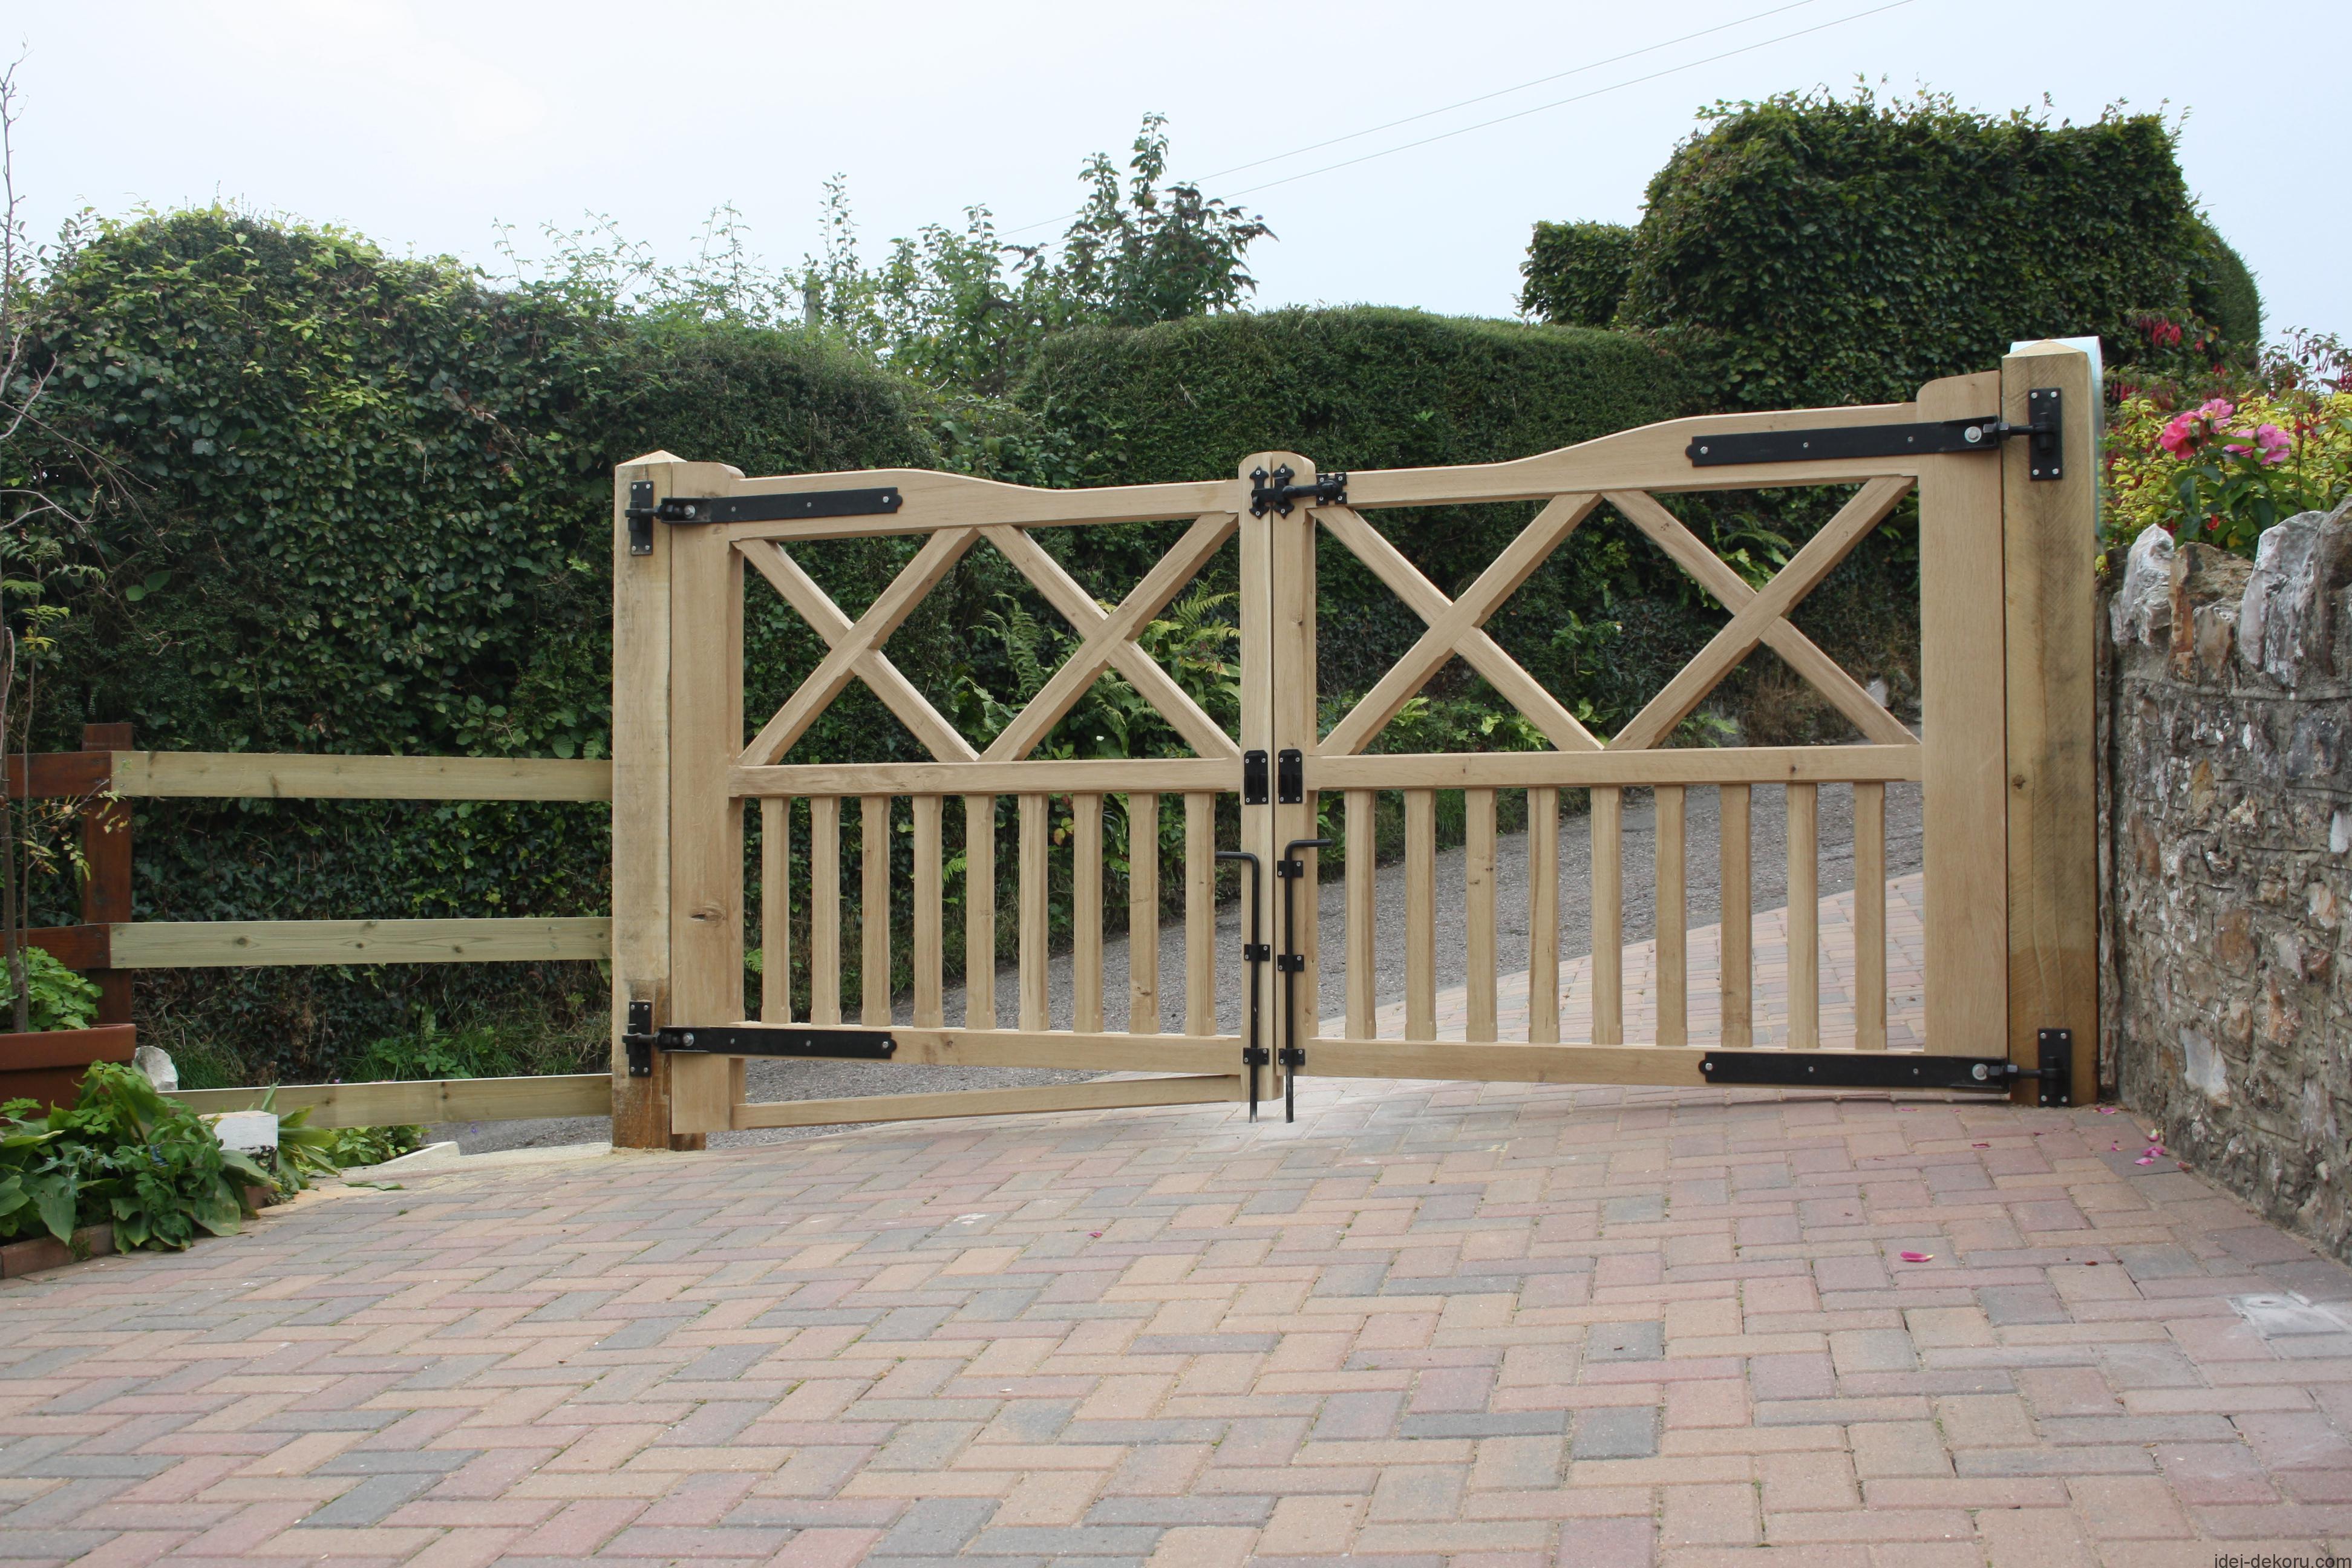 p-driveway-gates-wood-uk-driveway-gates-designs-wood-driveway-wood-gates-designs-wood-driveway-gates-designs-wood-driveway-gates-dallas-wood-driveway-gates-san-diego-driveway-gates-wood-farm-wo